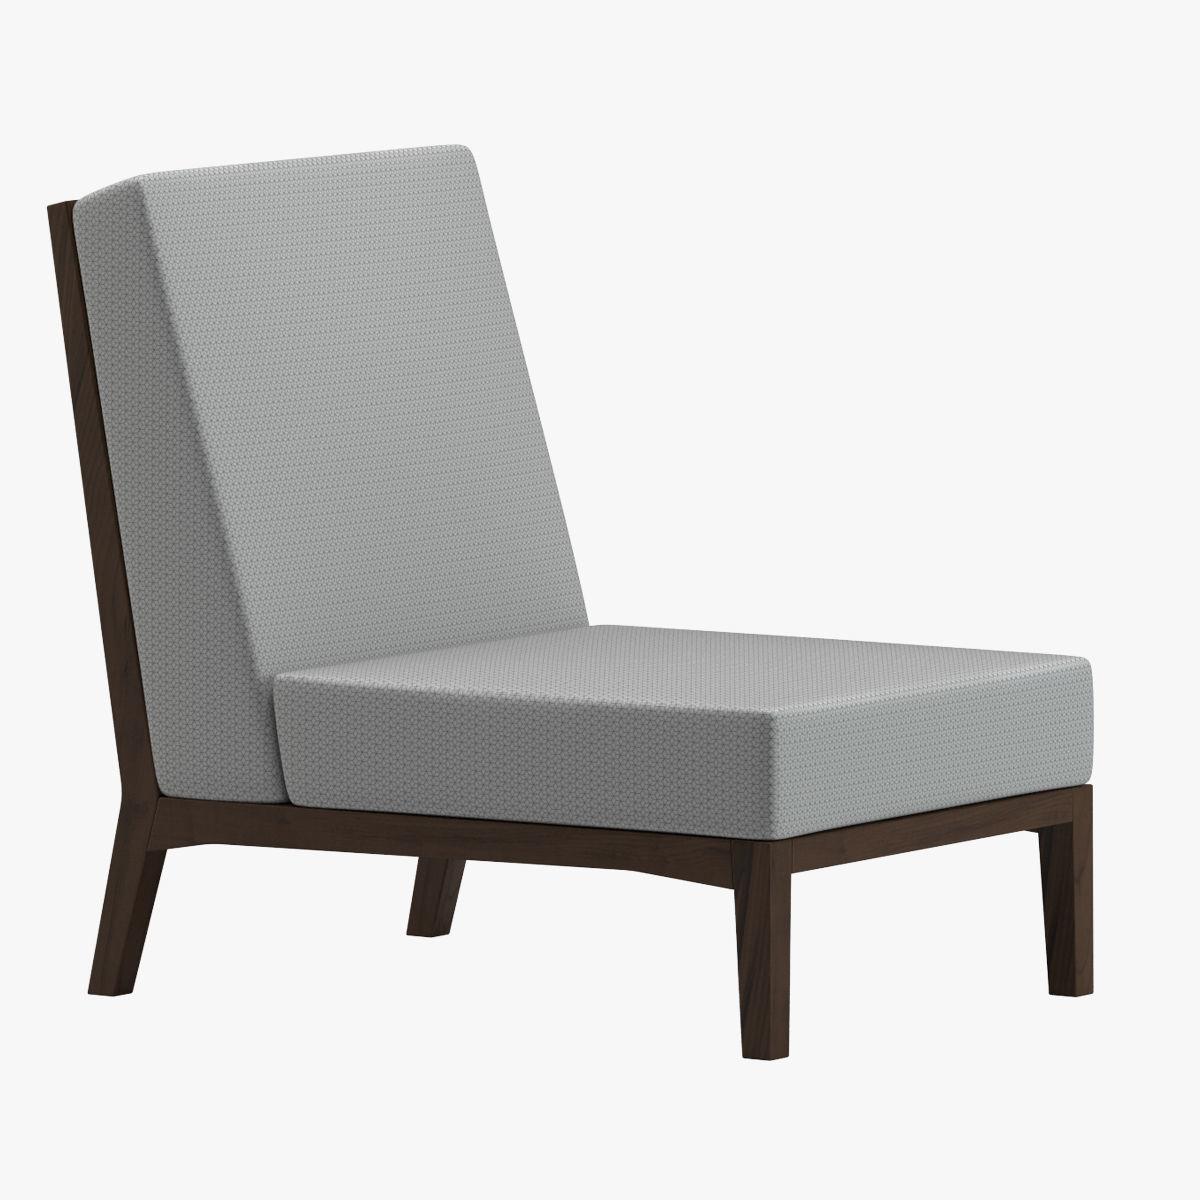 Holly Hunt IO chair